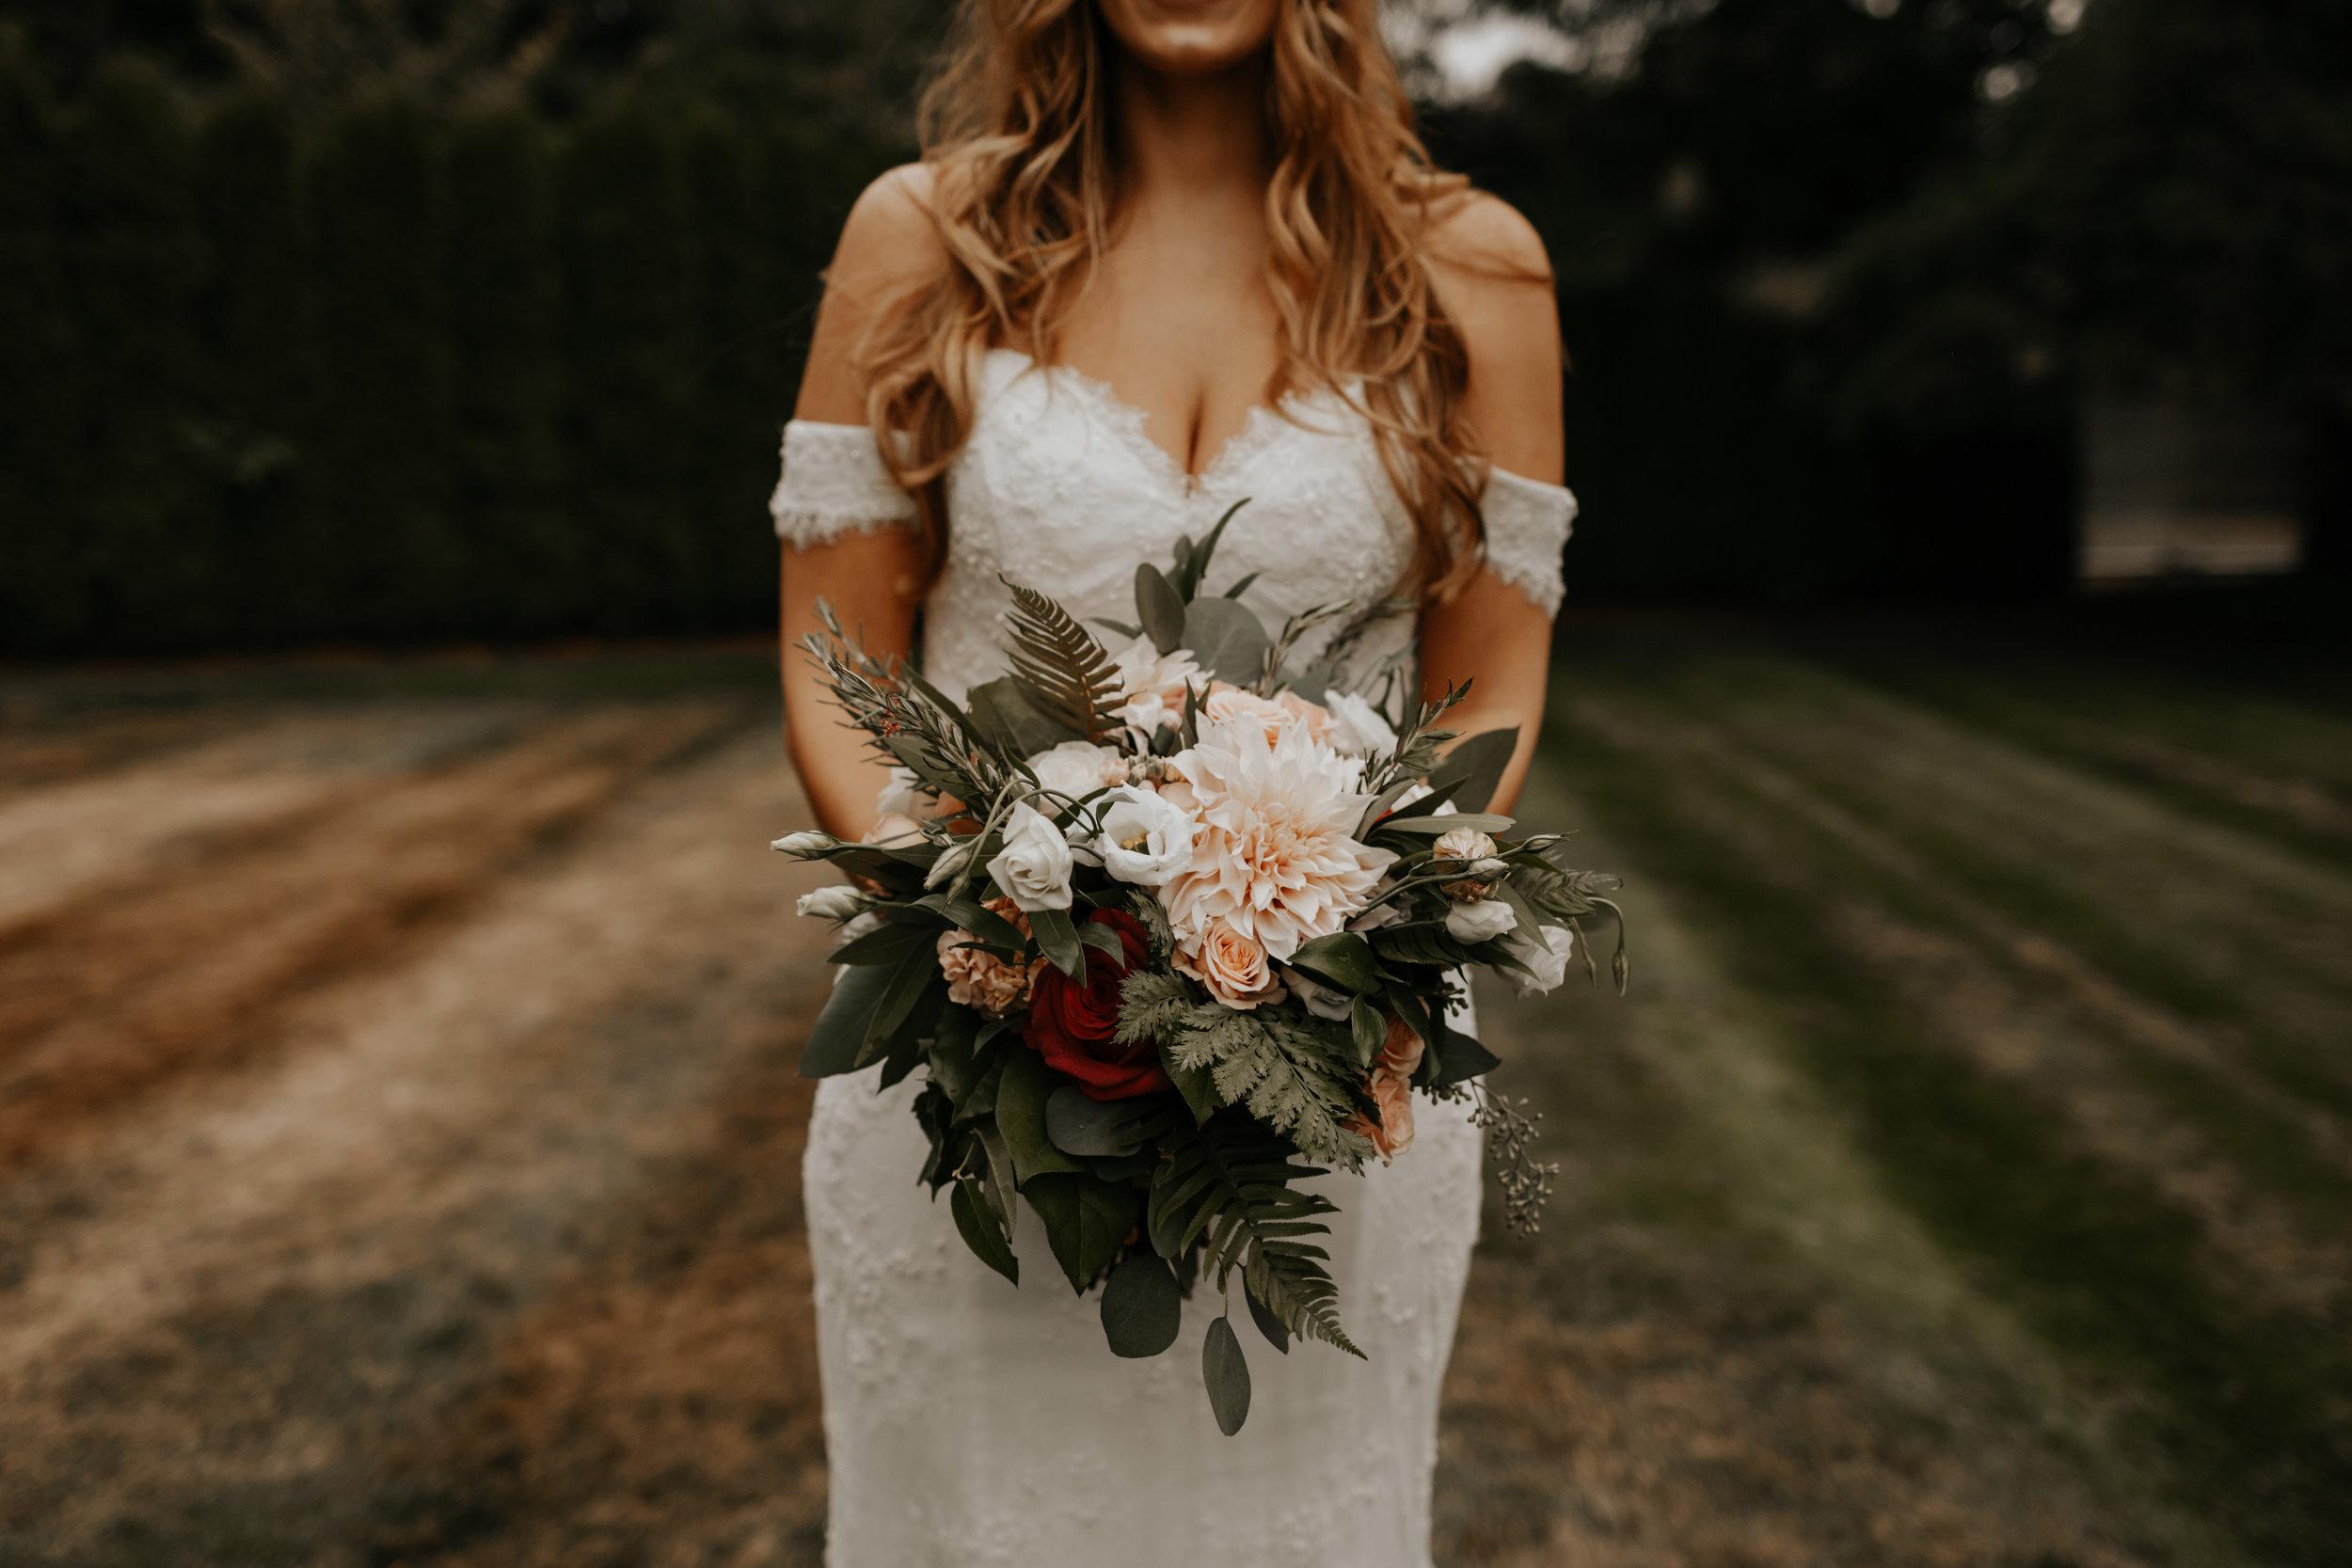 ginapaulson_jakitrevor_wedding-125.jpg